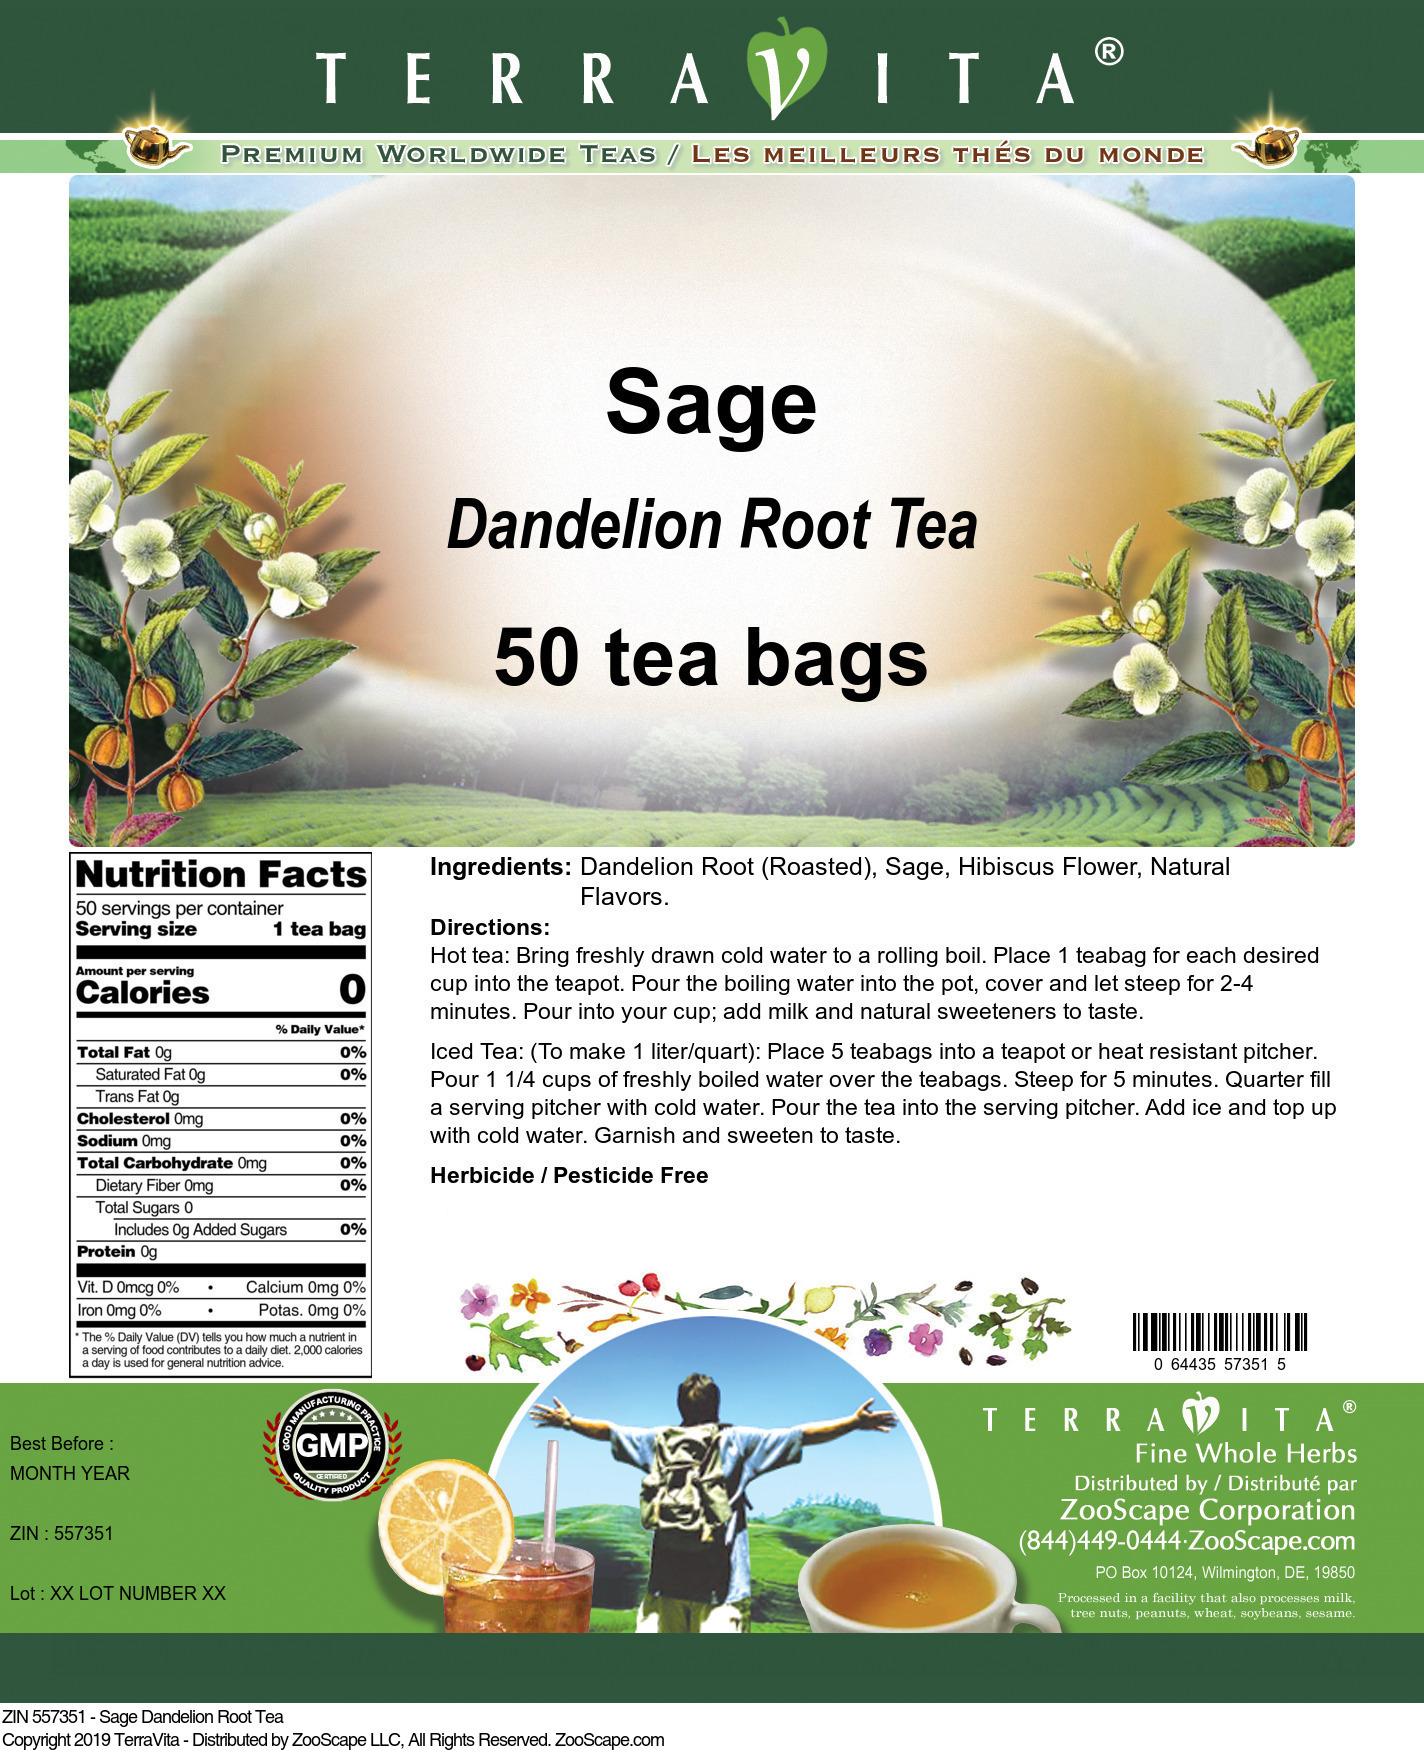 Sage Dandelion Root